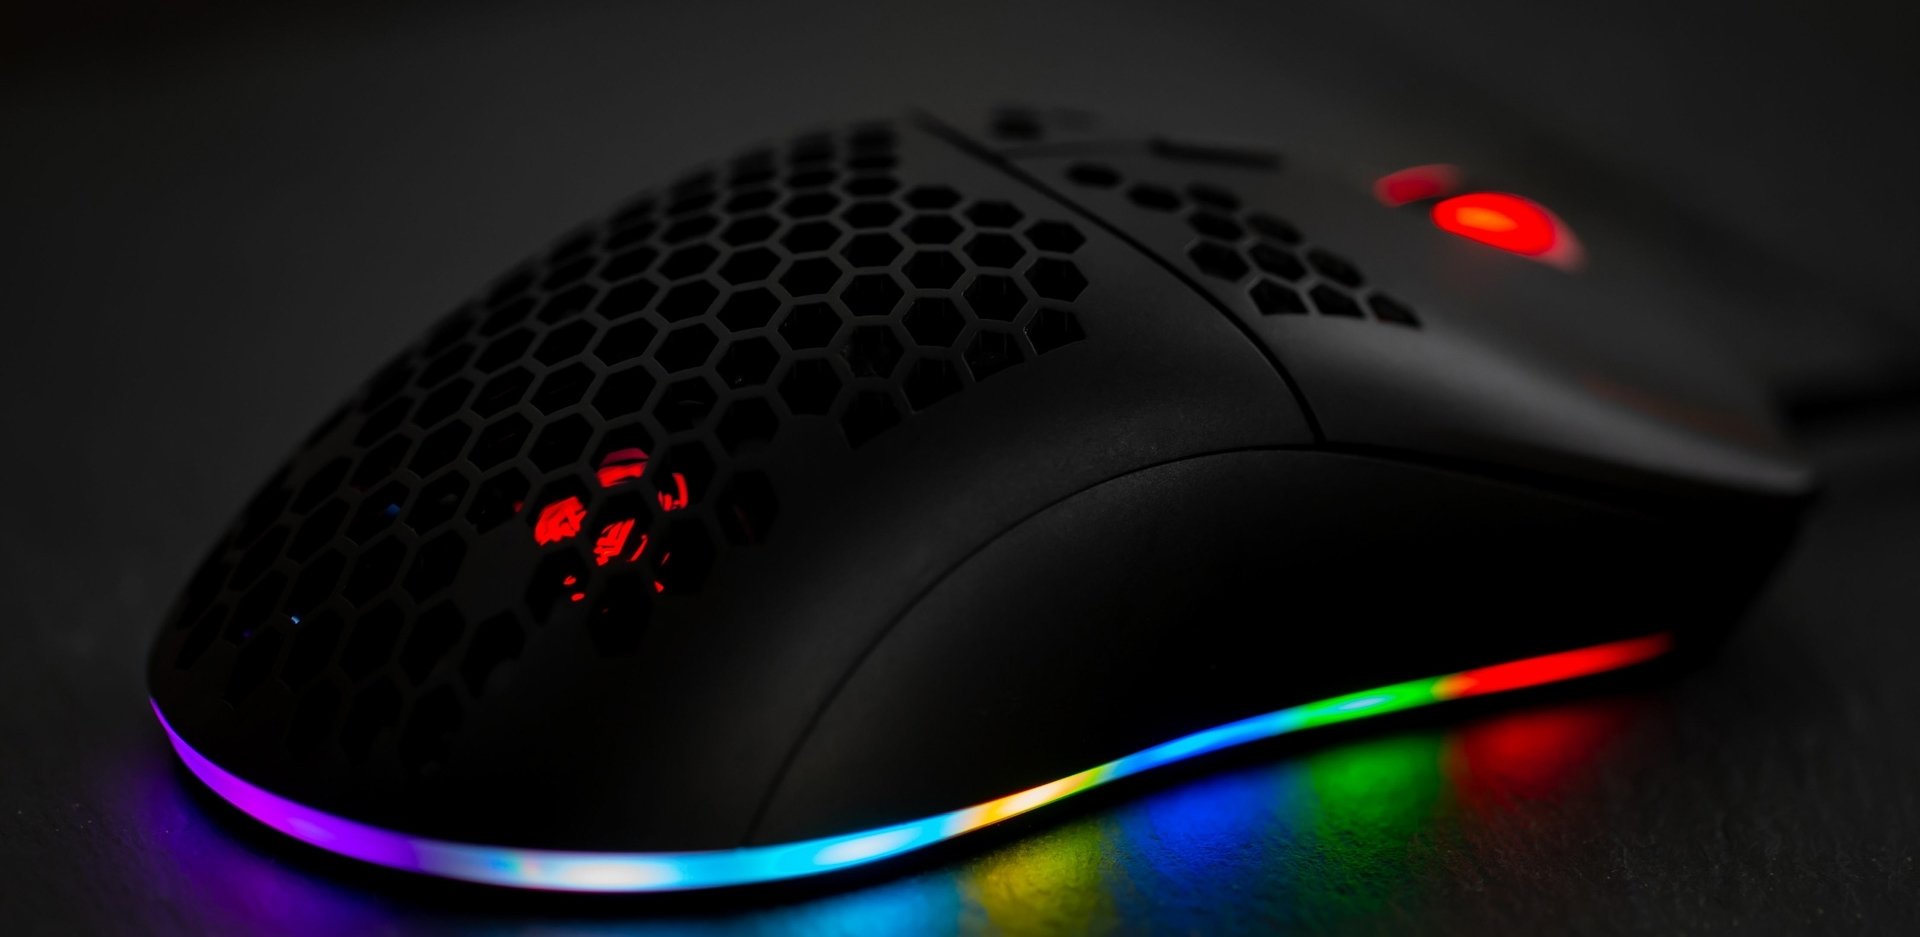 ZeroGround Harado 2.0 - Gaming mouse